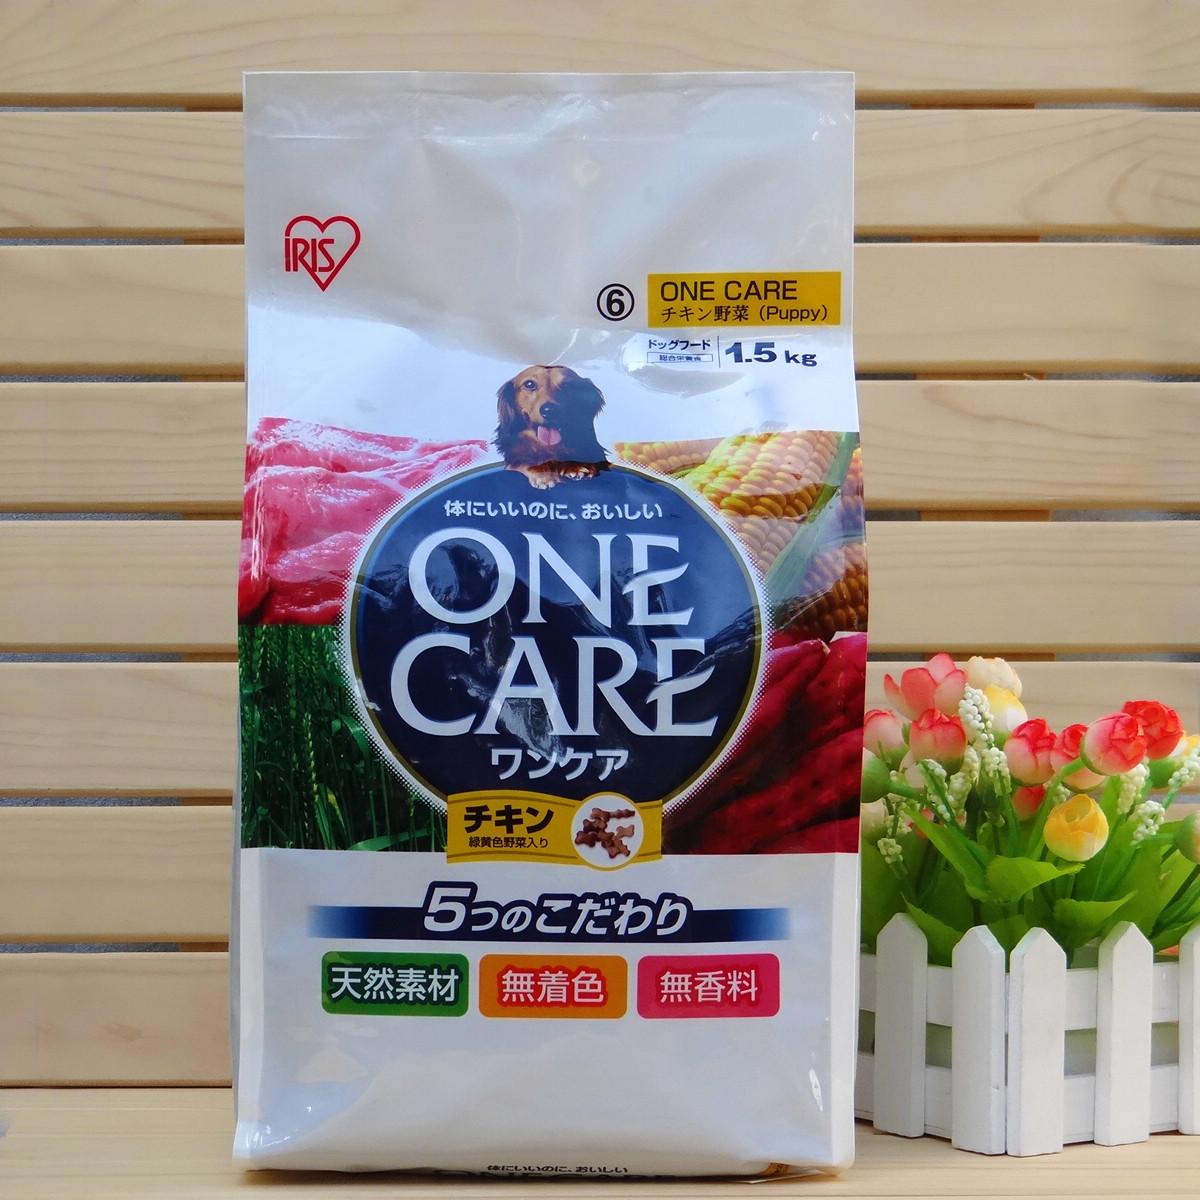 корм для собак IRIS OCP /80c Onecare 1.5kg (22  цена и фото